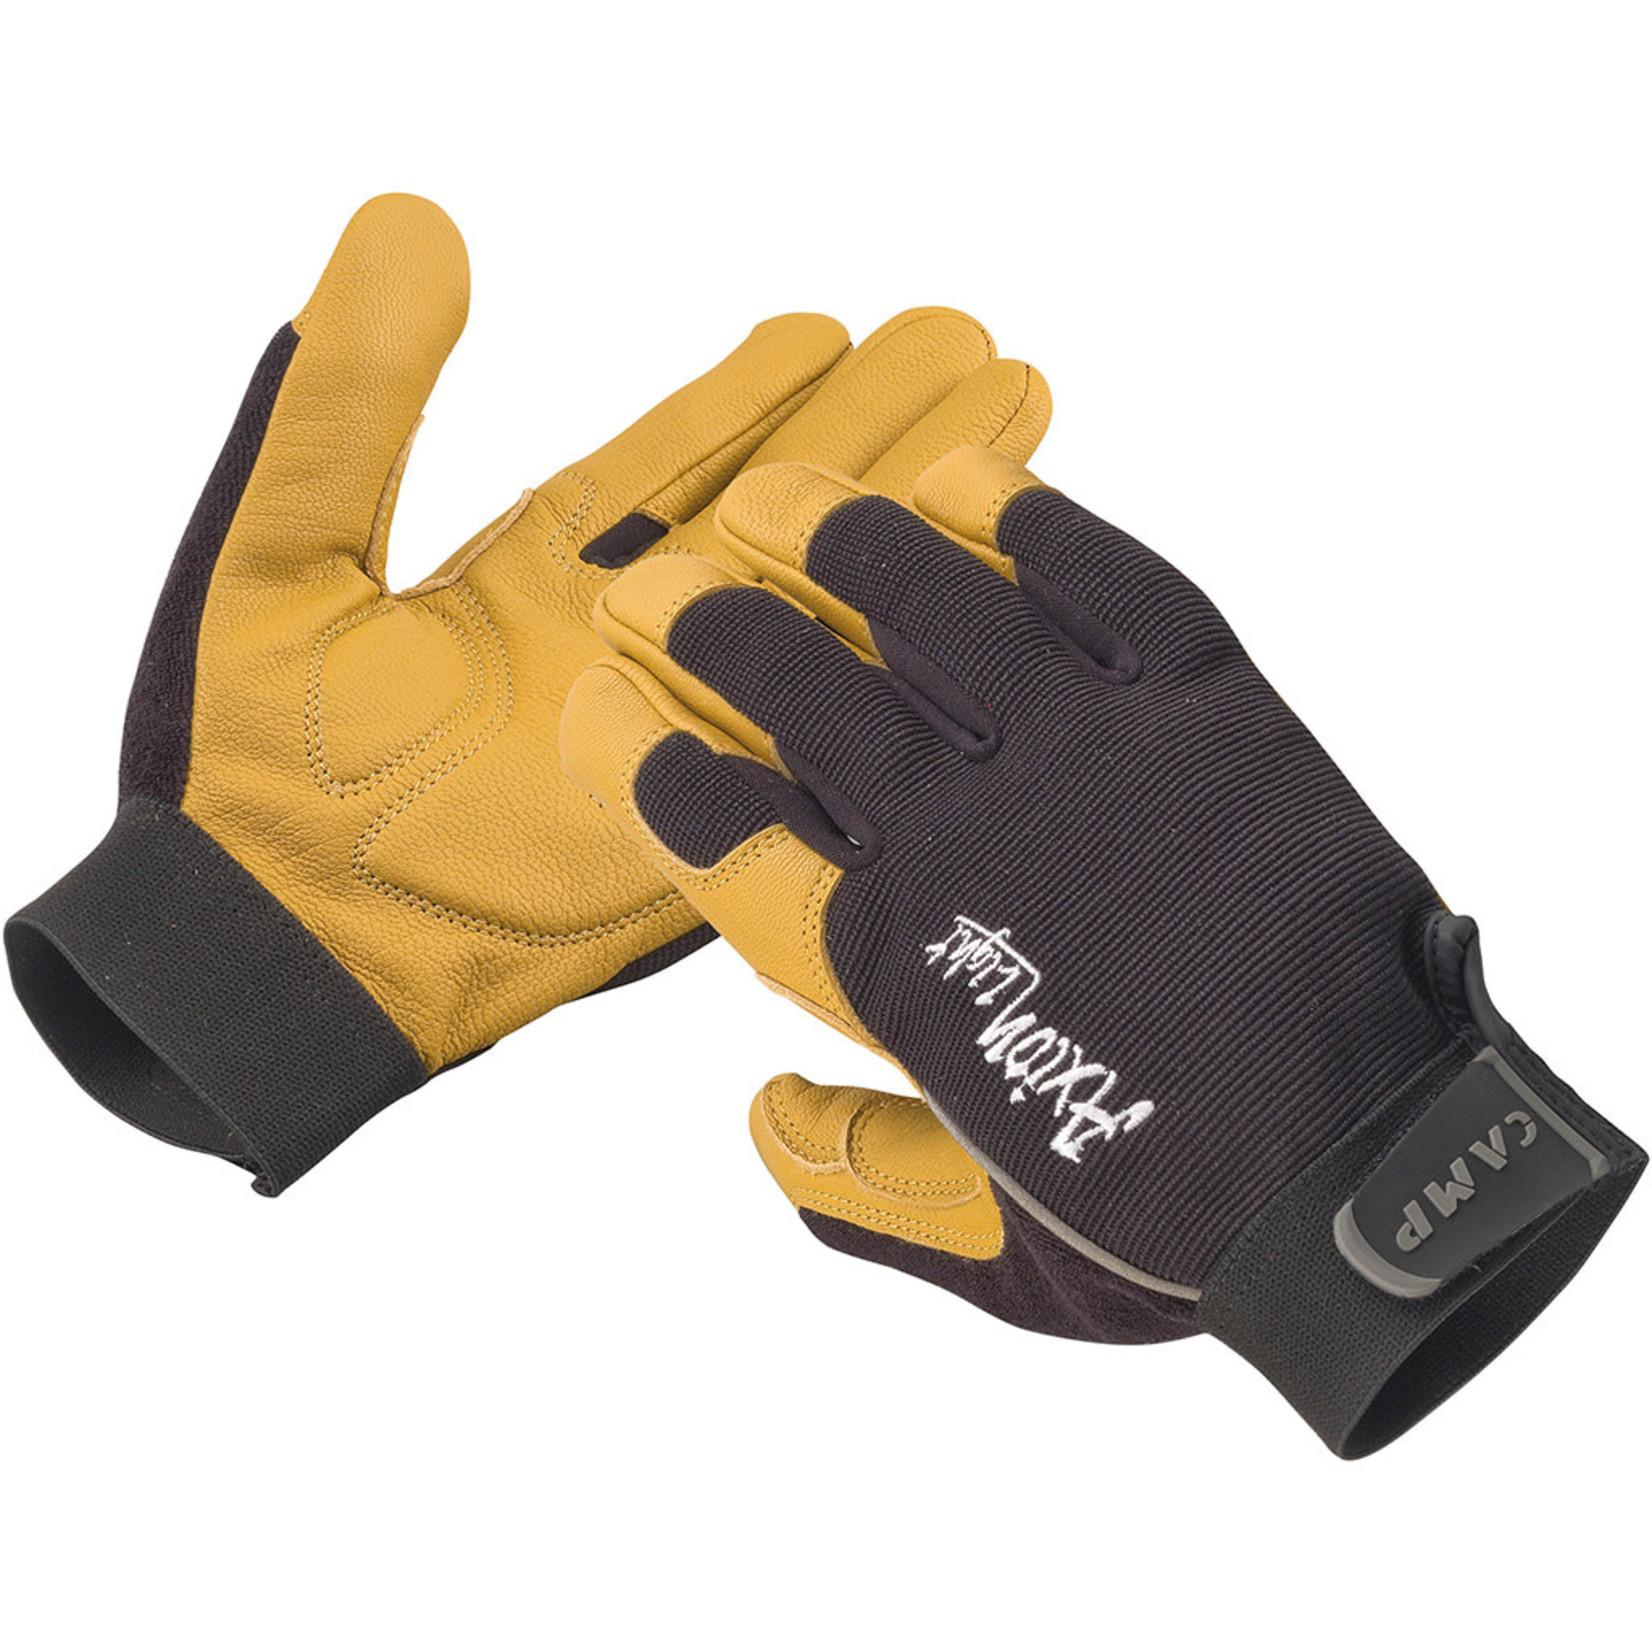 Camp Gants Camp Axion Light Glove